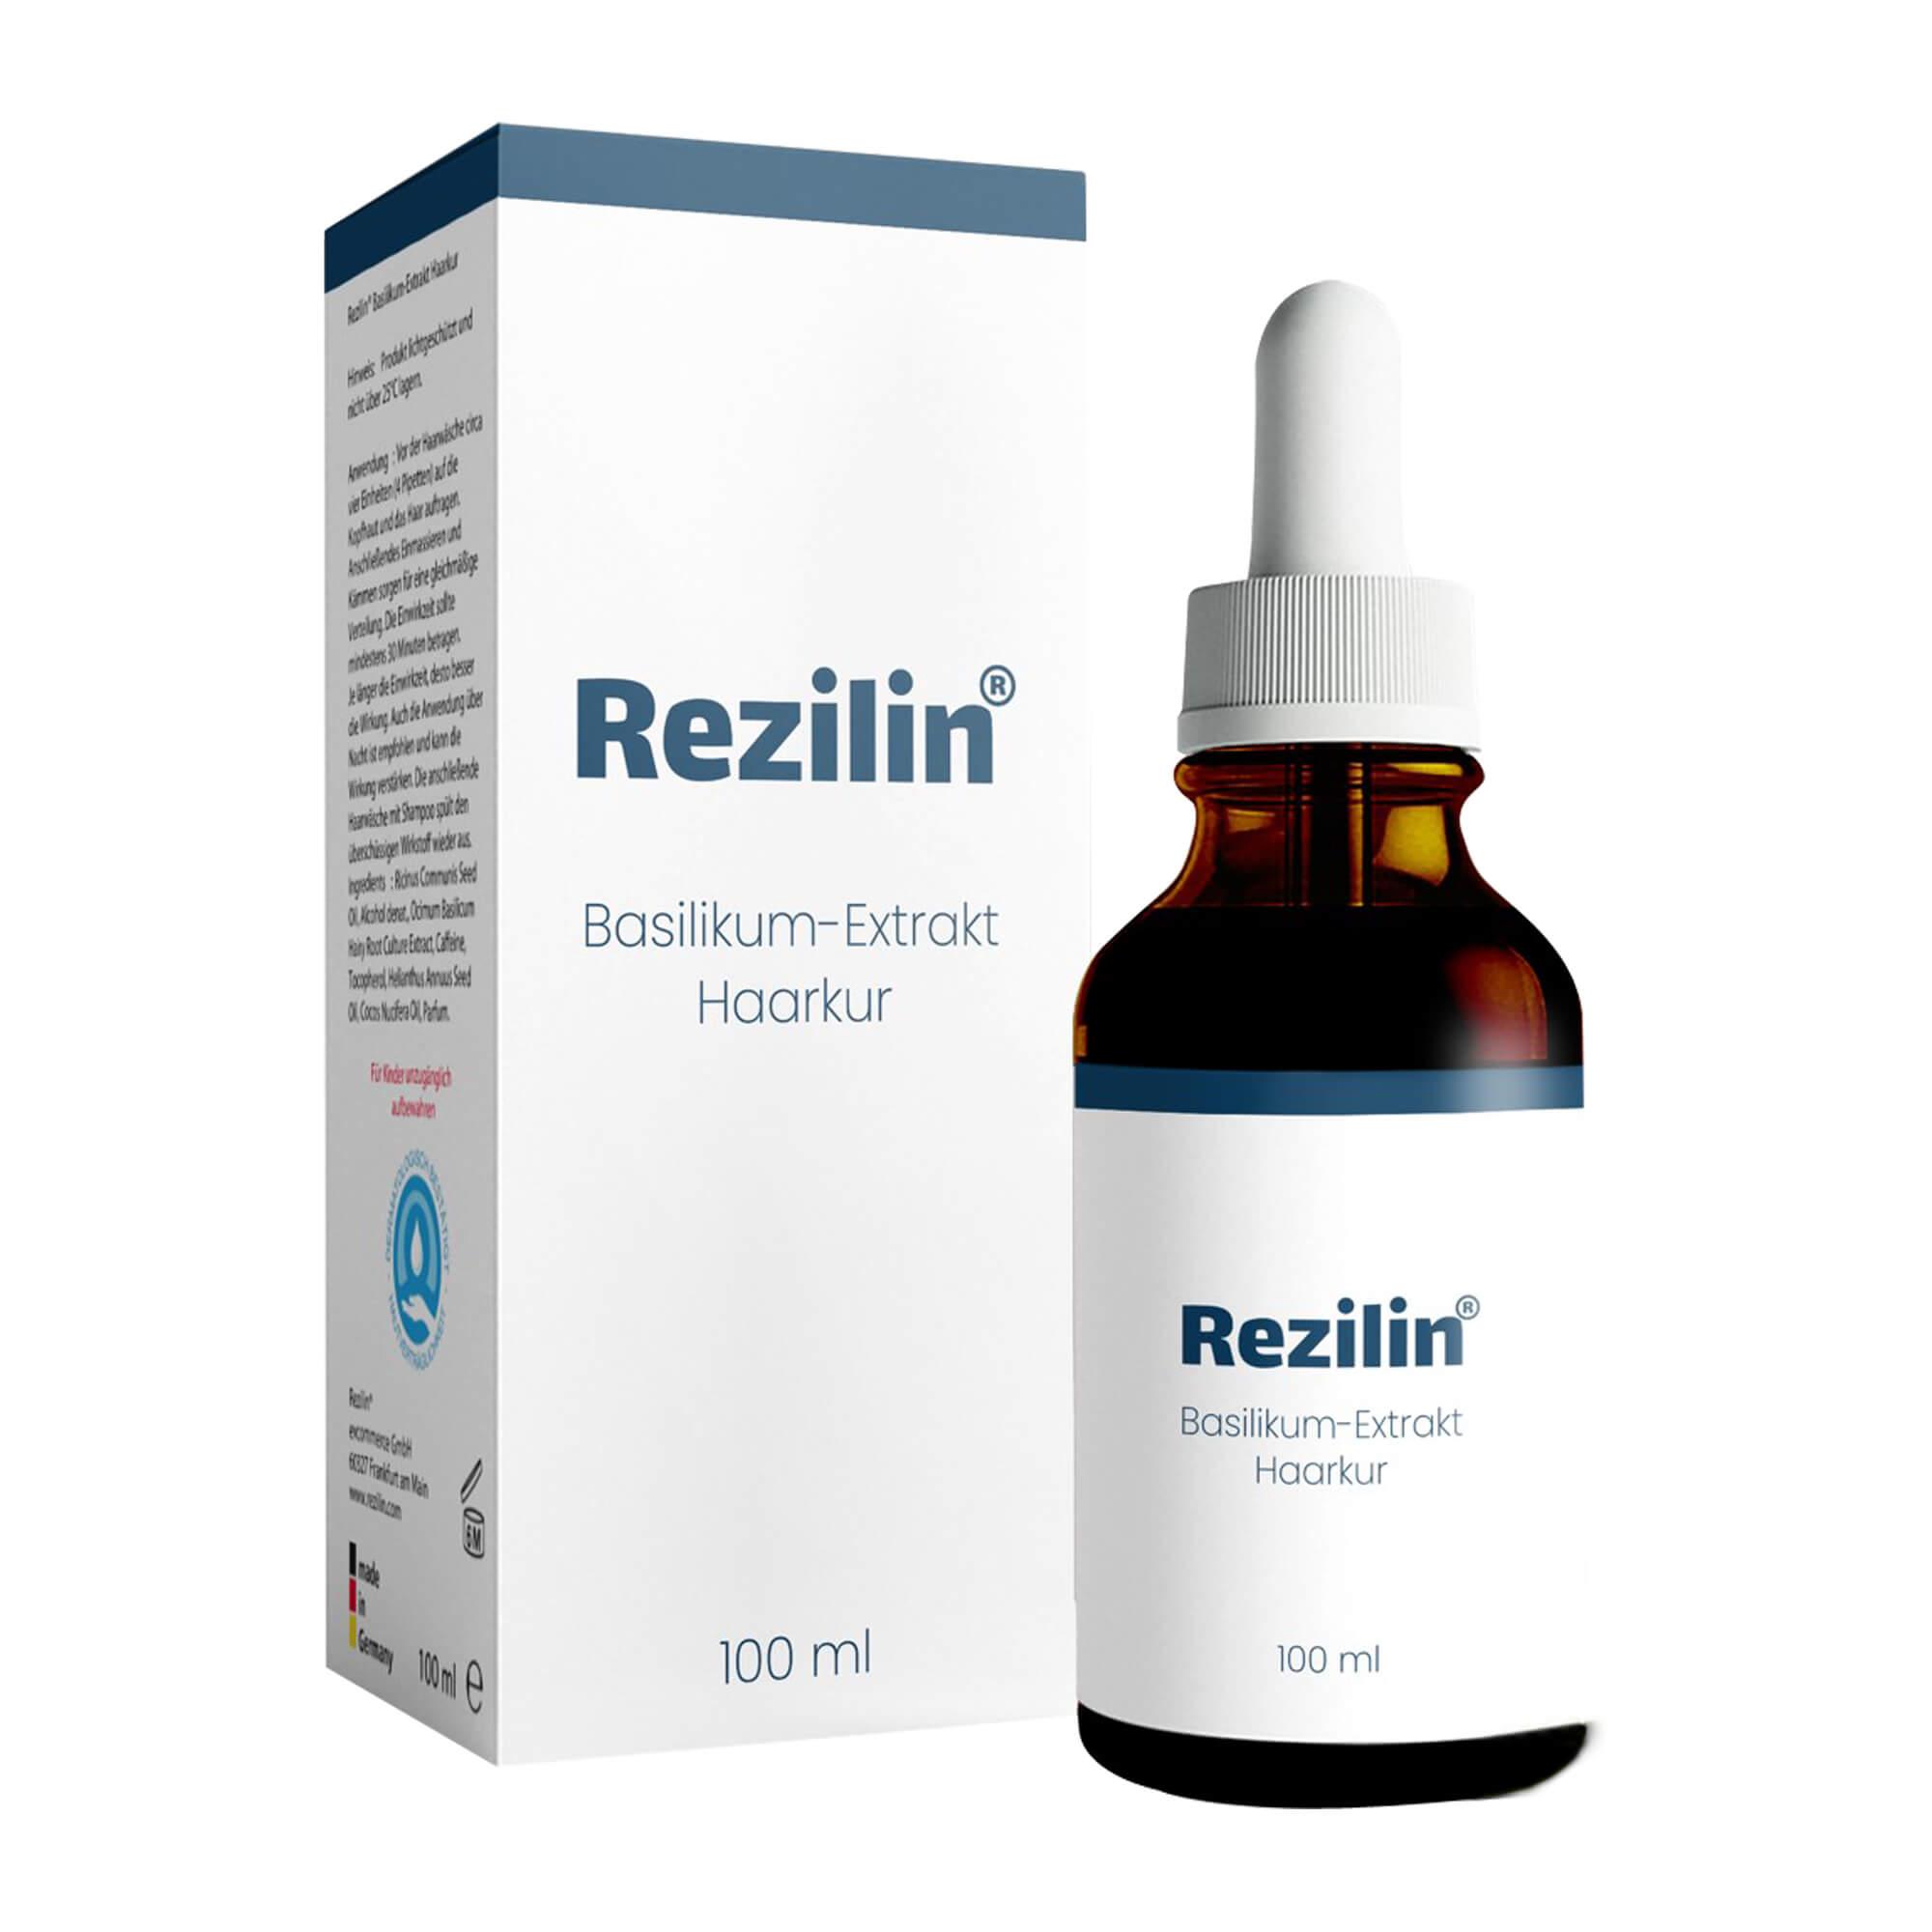 Rezilin Basilikum-Extrakt Haarkur